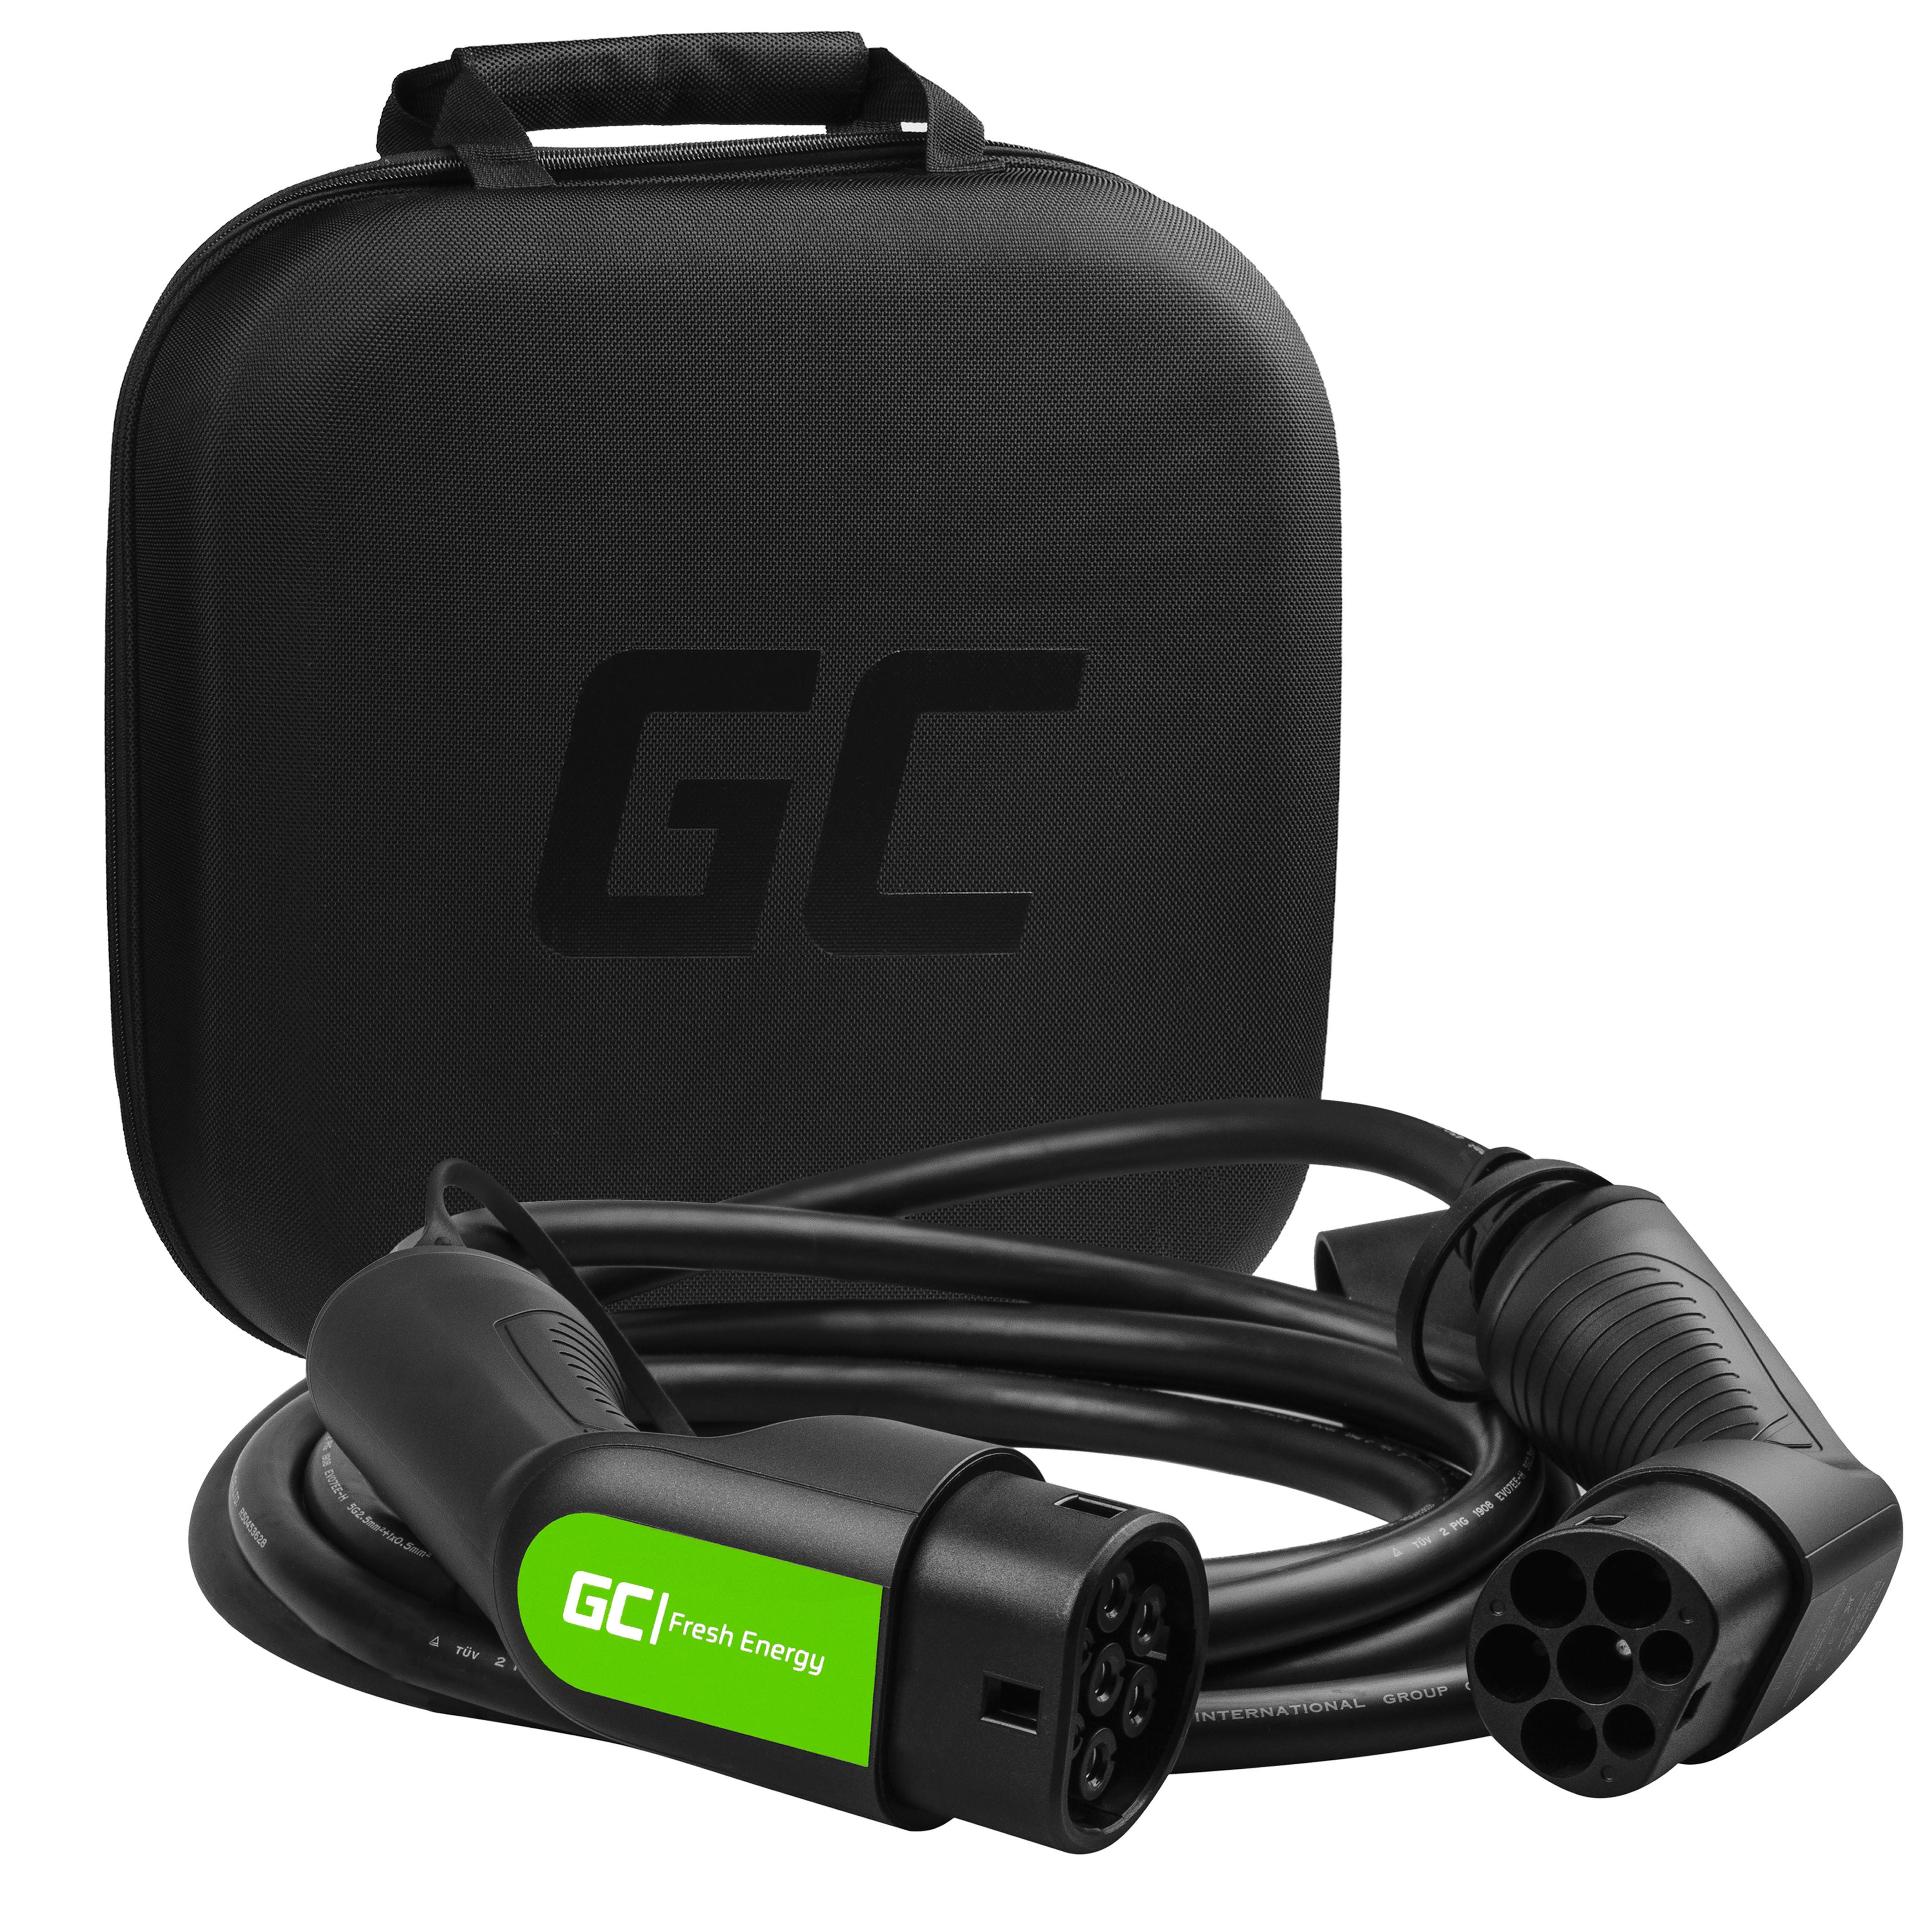 Cable Green Cell GC Type 2 22kW 16.4 ft for charging EV Tesla Leaf Ioniq Kona E-tron Zoe